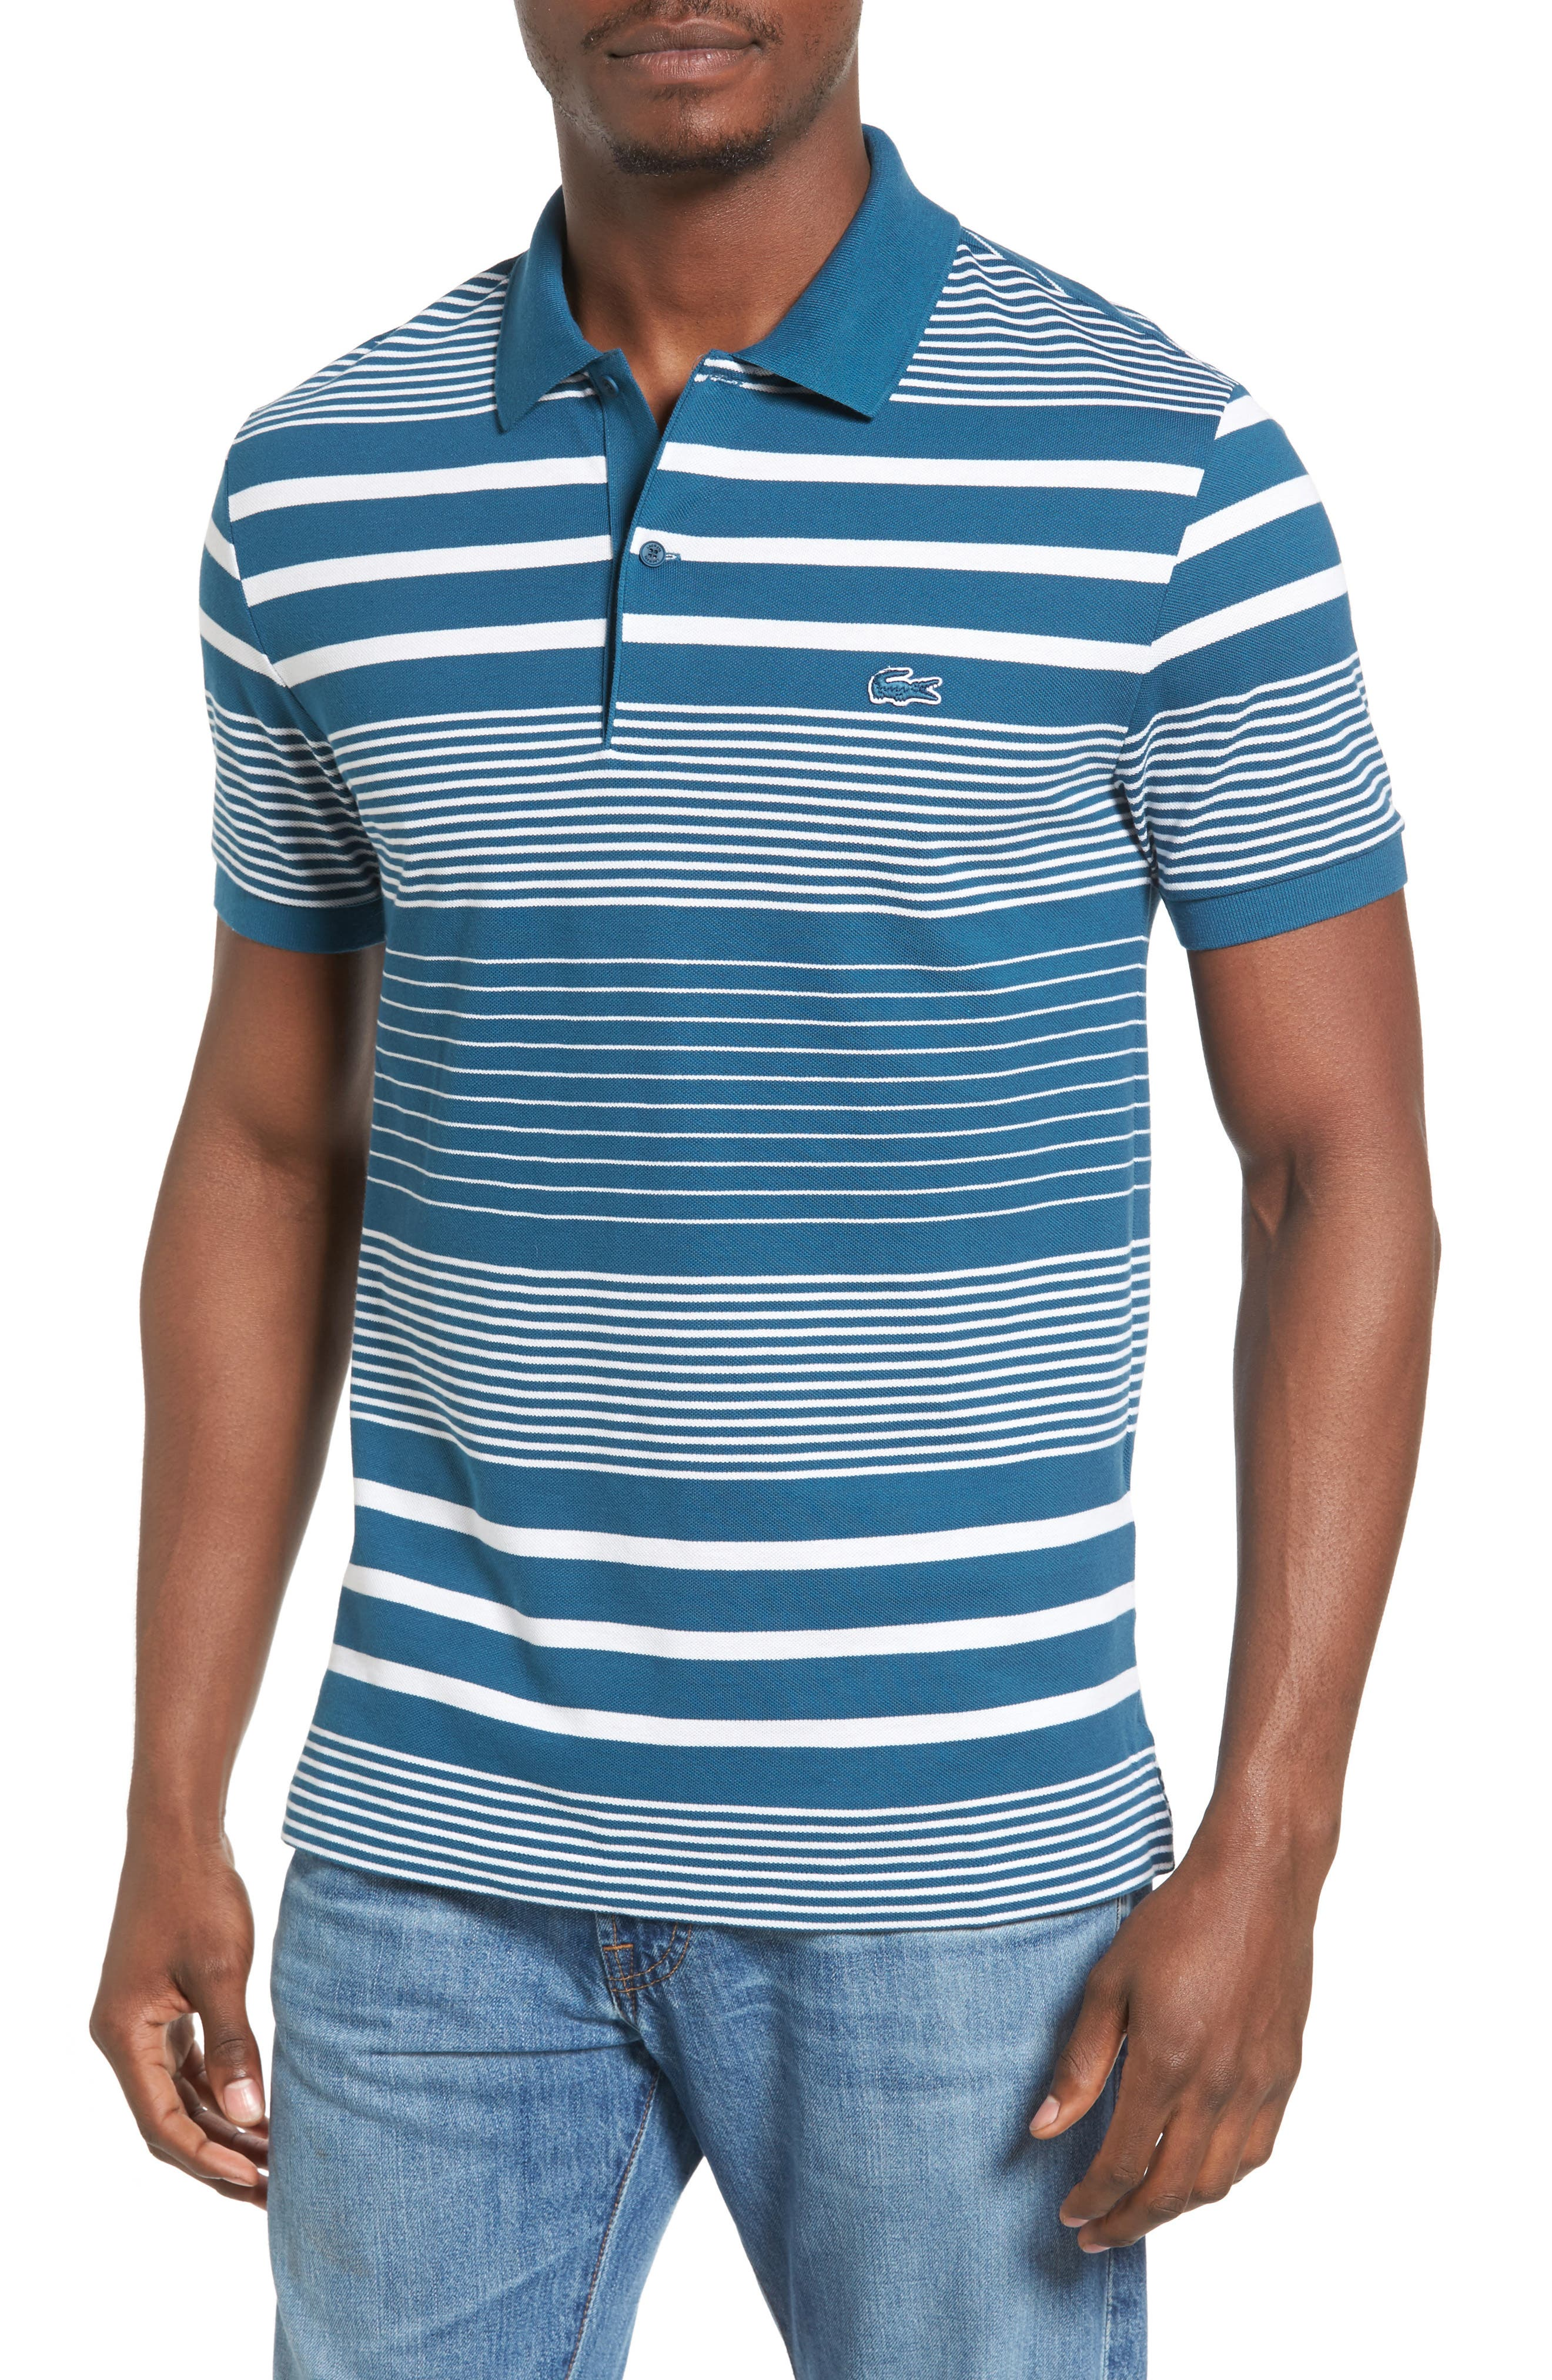 Main Image - Lacoste Stripe Piqué Polo